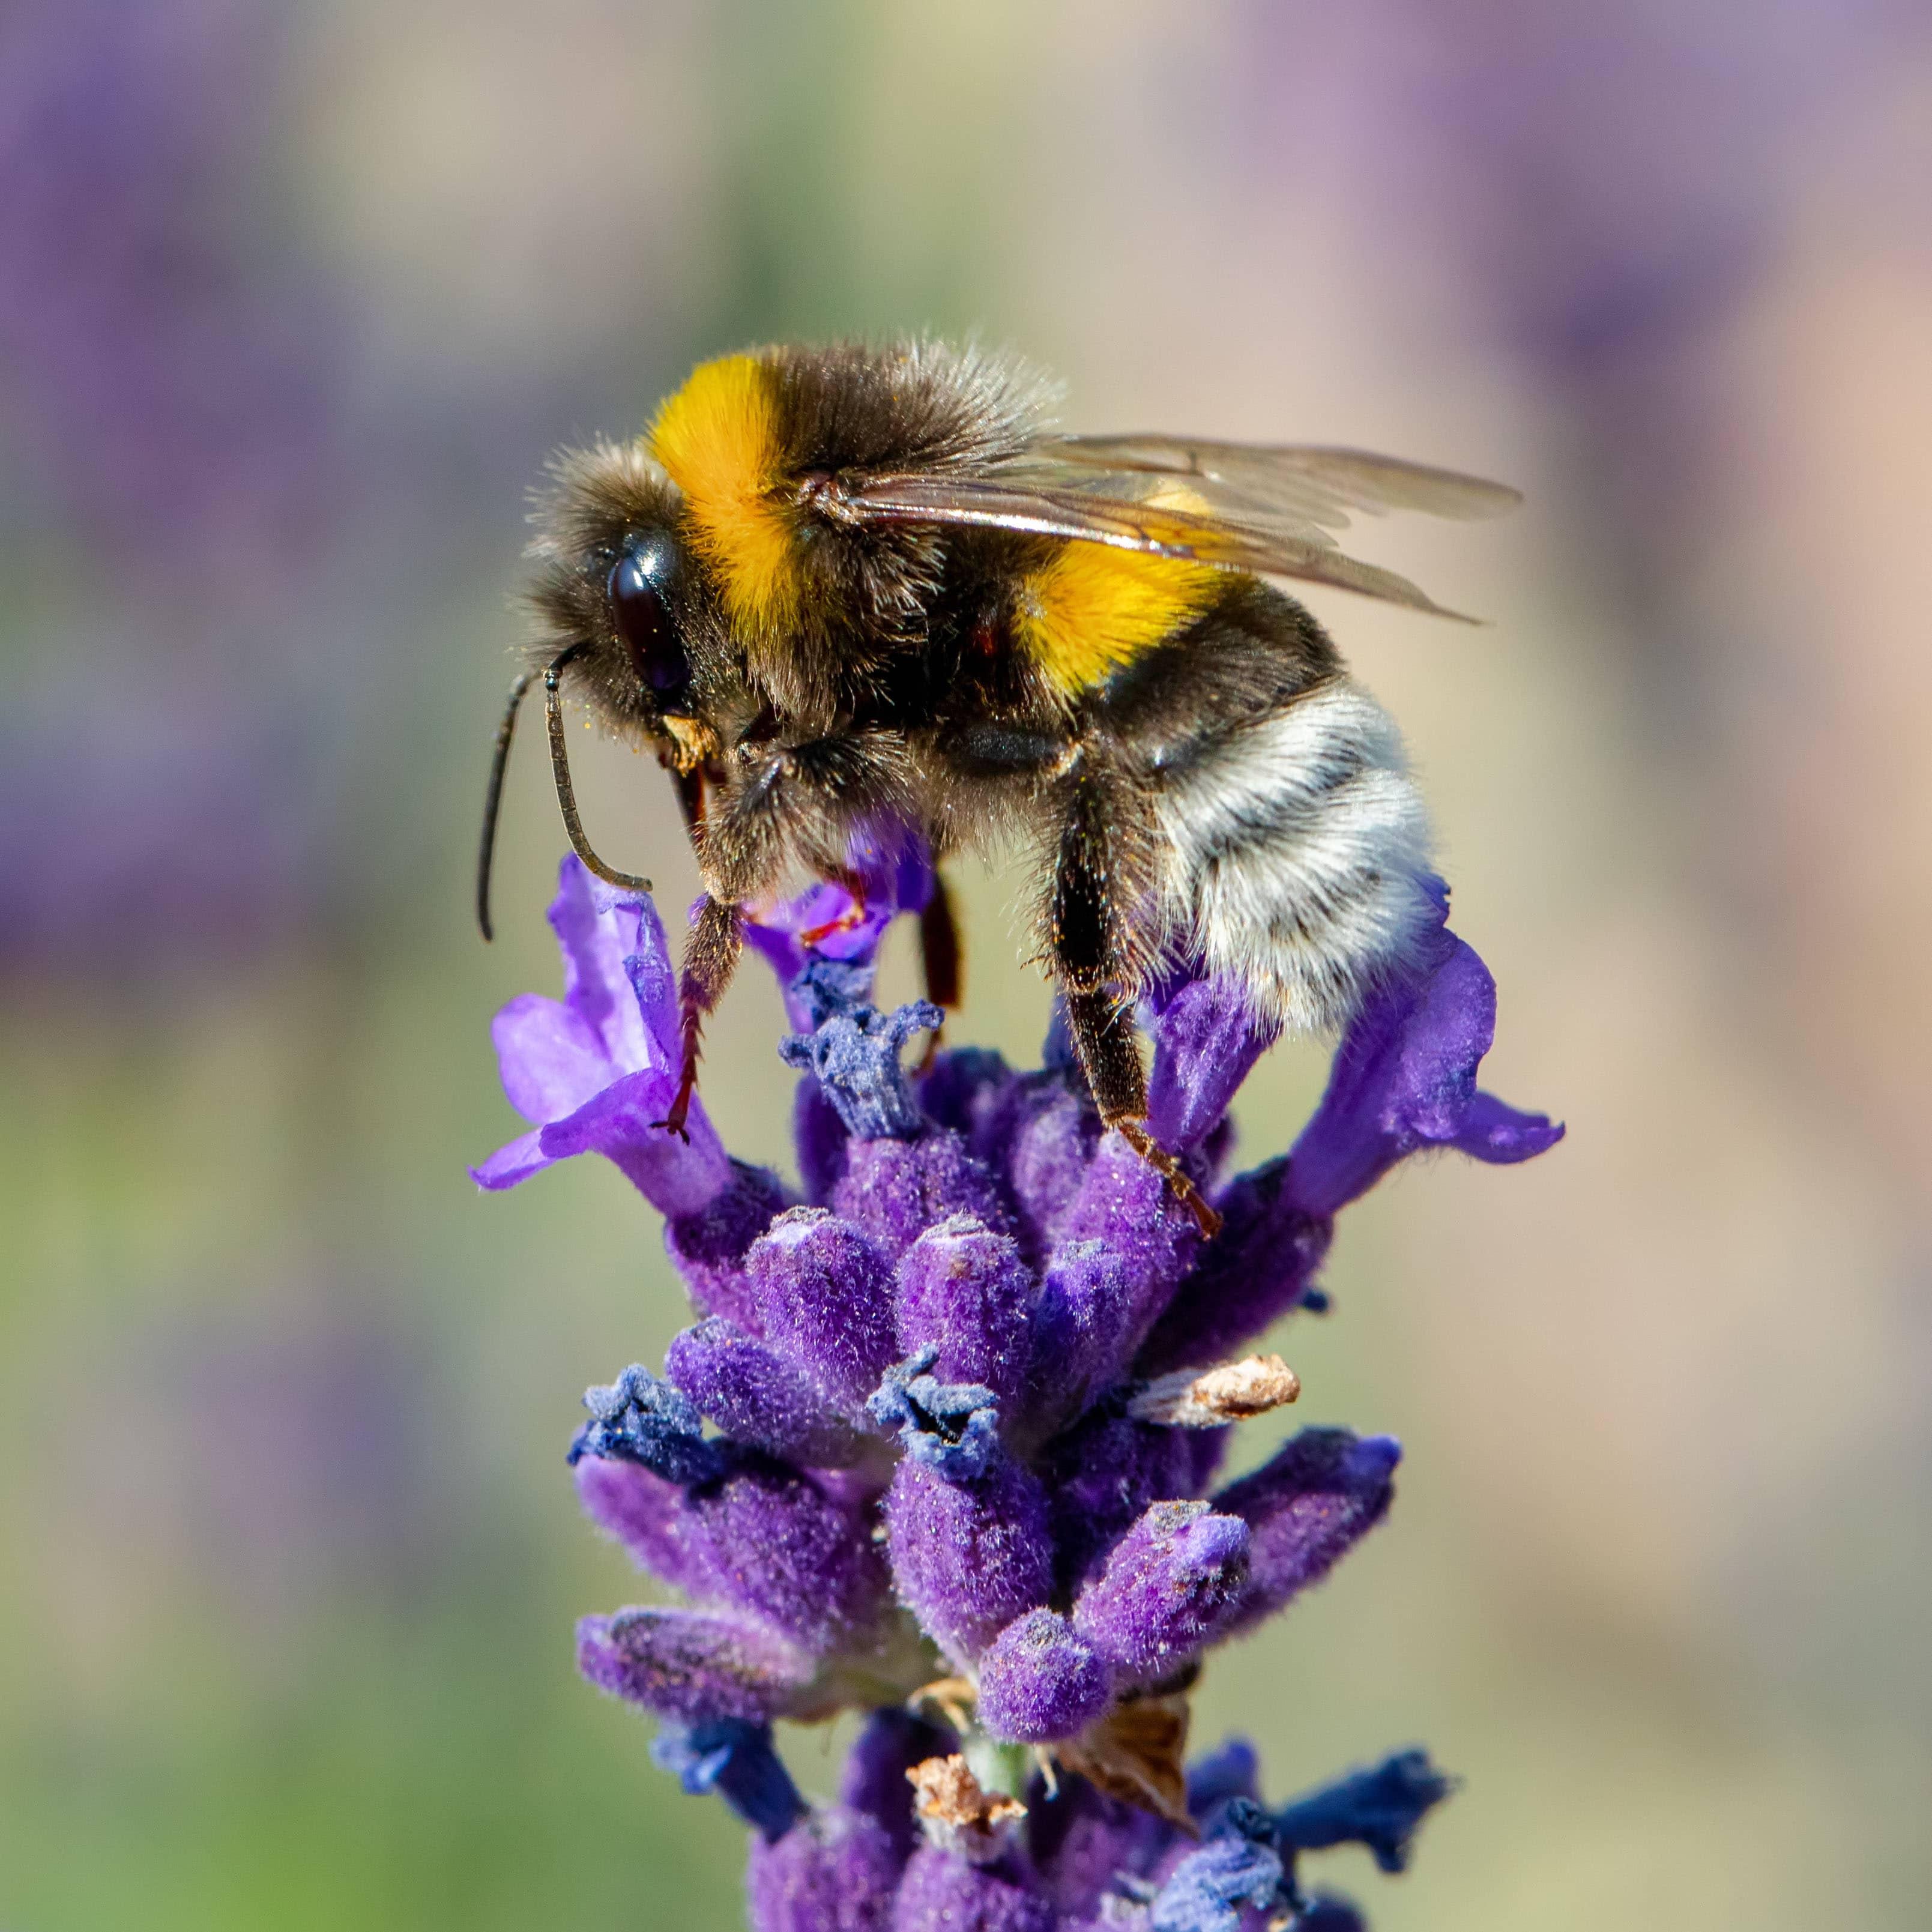 diligent bee sucks lavender nectar, summer concept, shallow focus